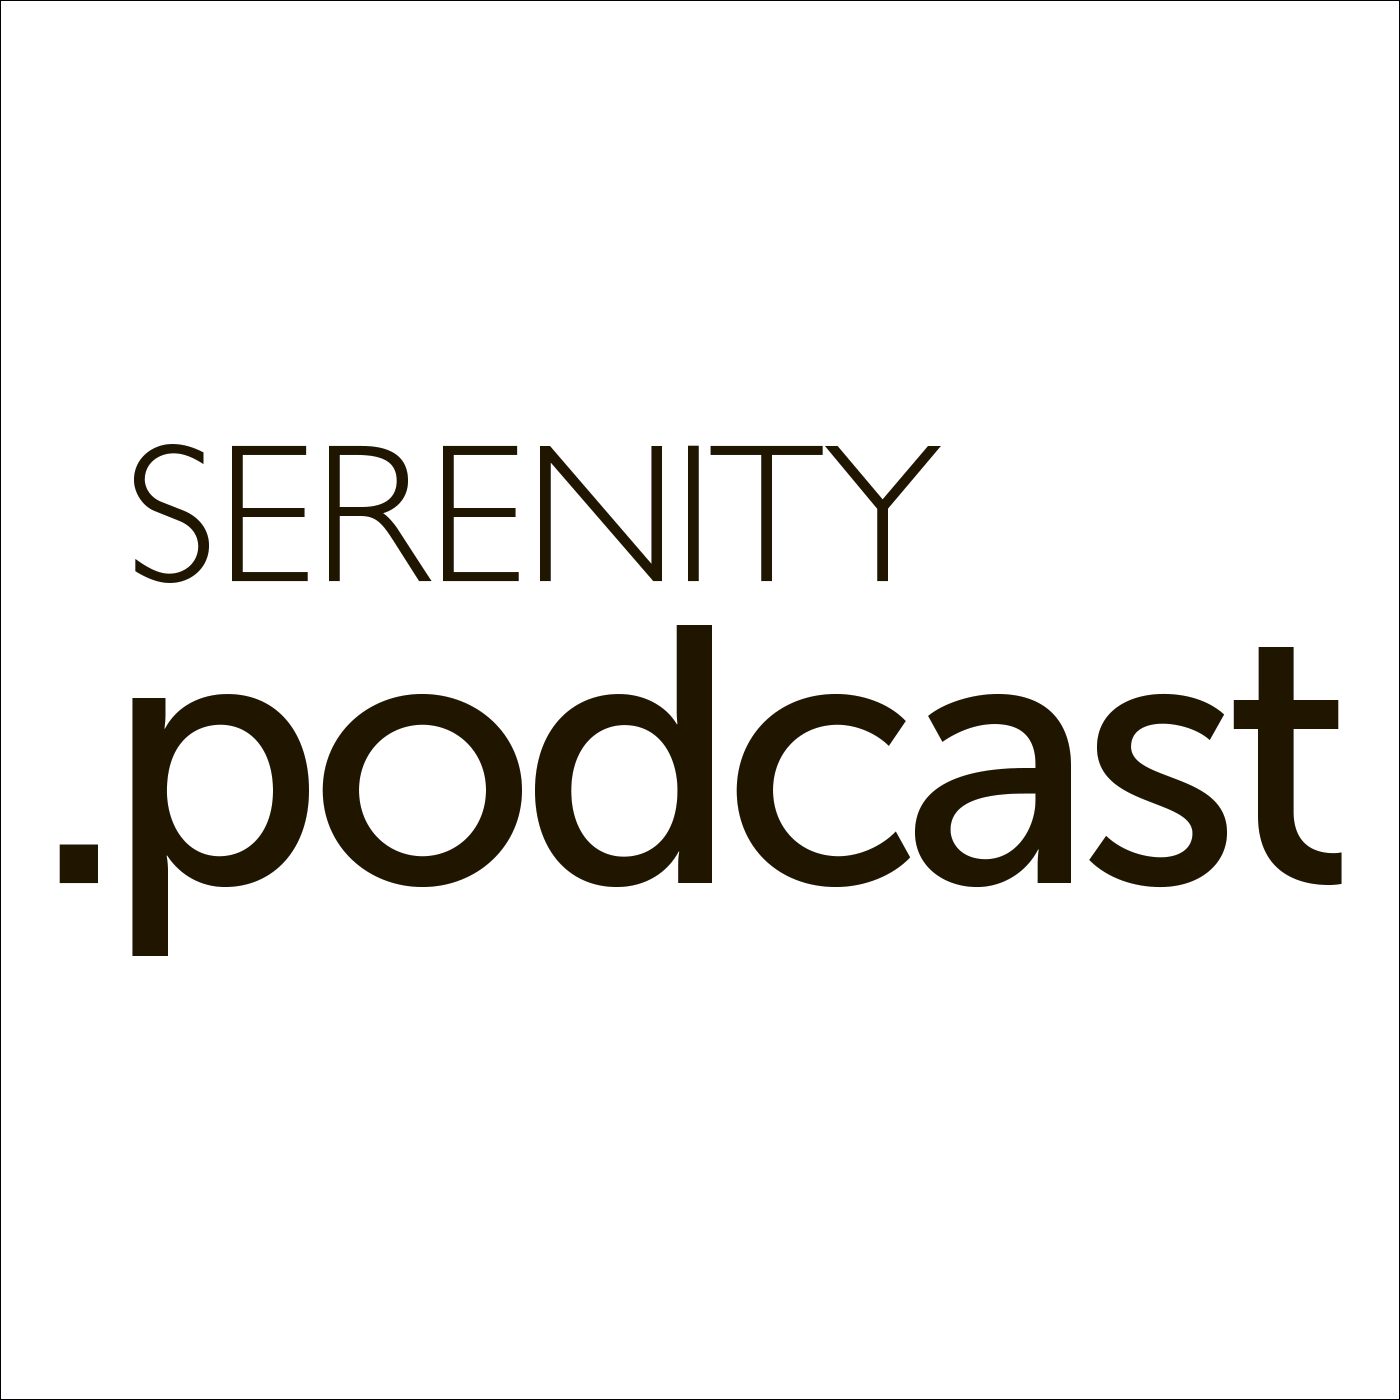 Serenity.Podcast